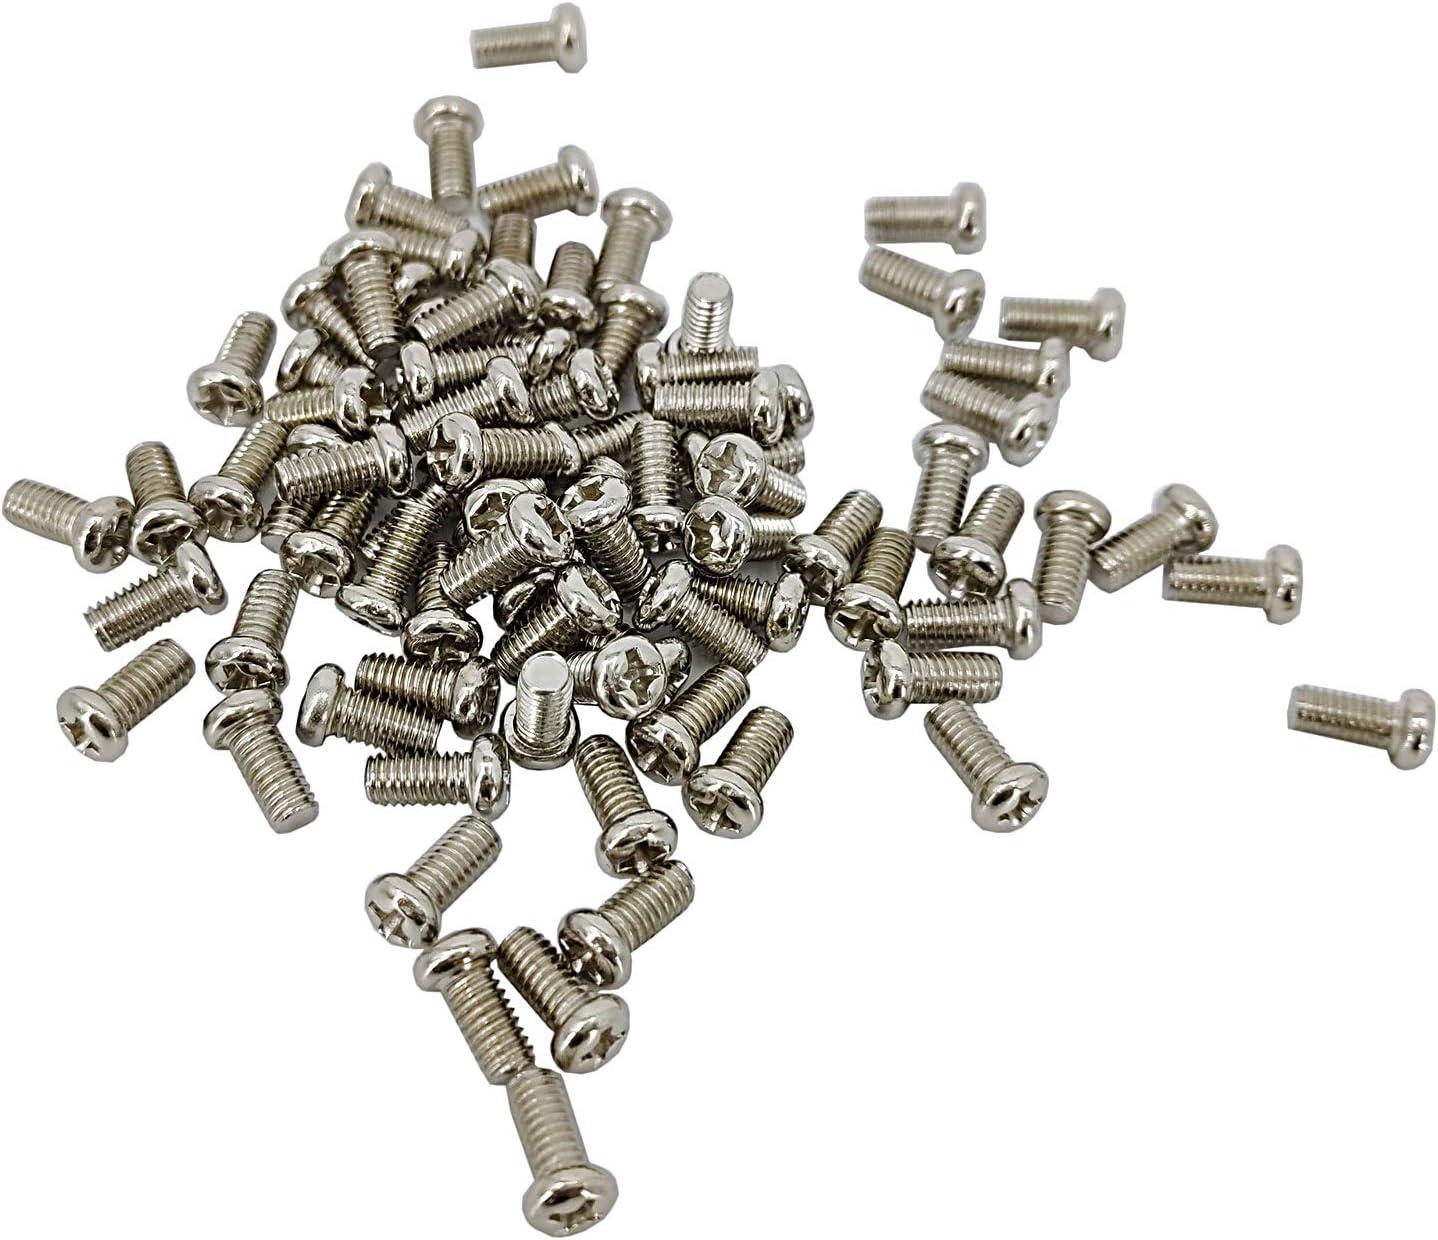 FixtureDisplays 100PK M4 X 8mm Pitch 0.7mm Round Head Metric Screw Phillips Drive Carbon Steel Nickel Plated Cross Recessed 304700